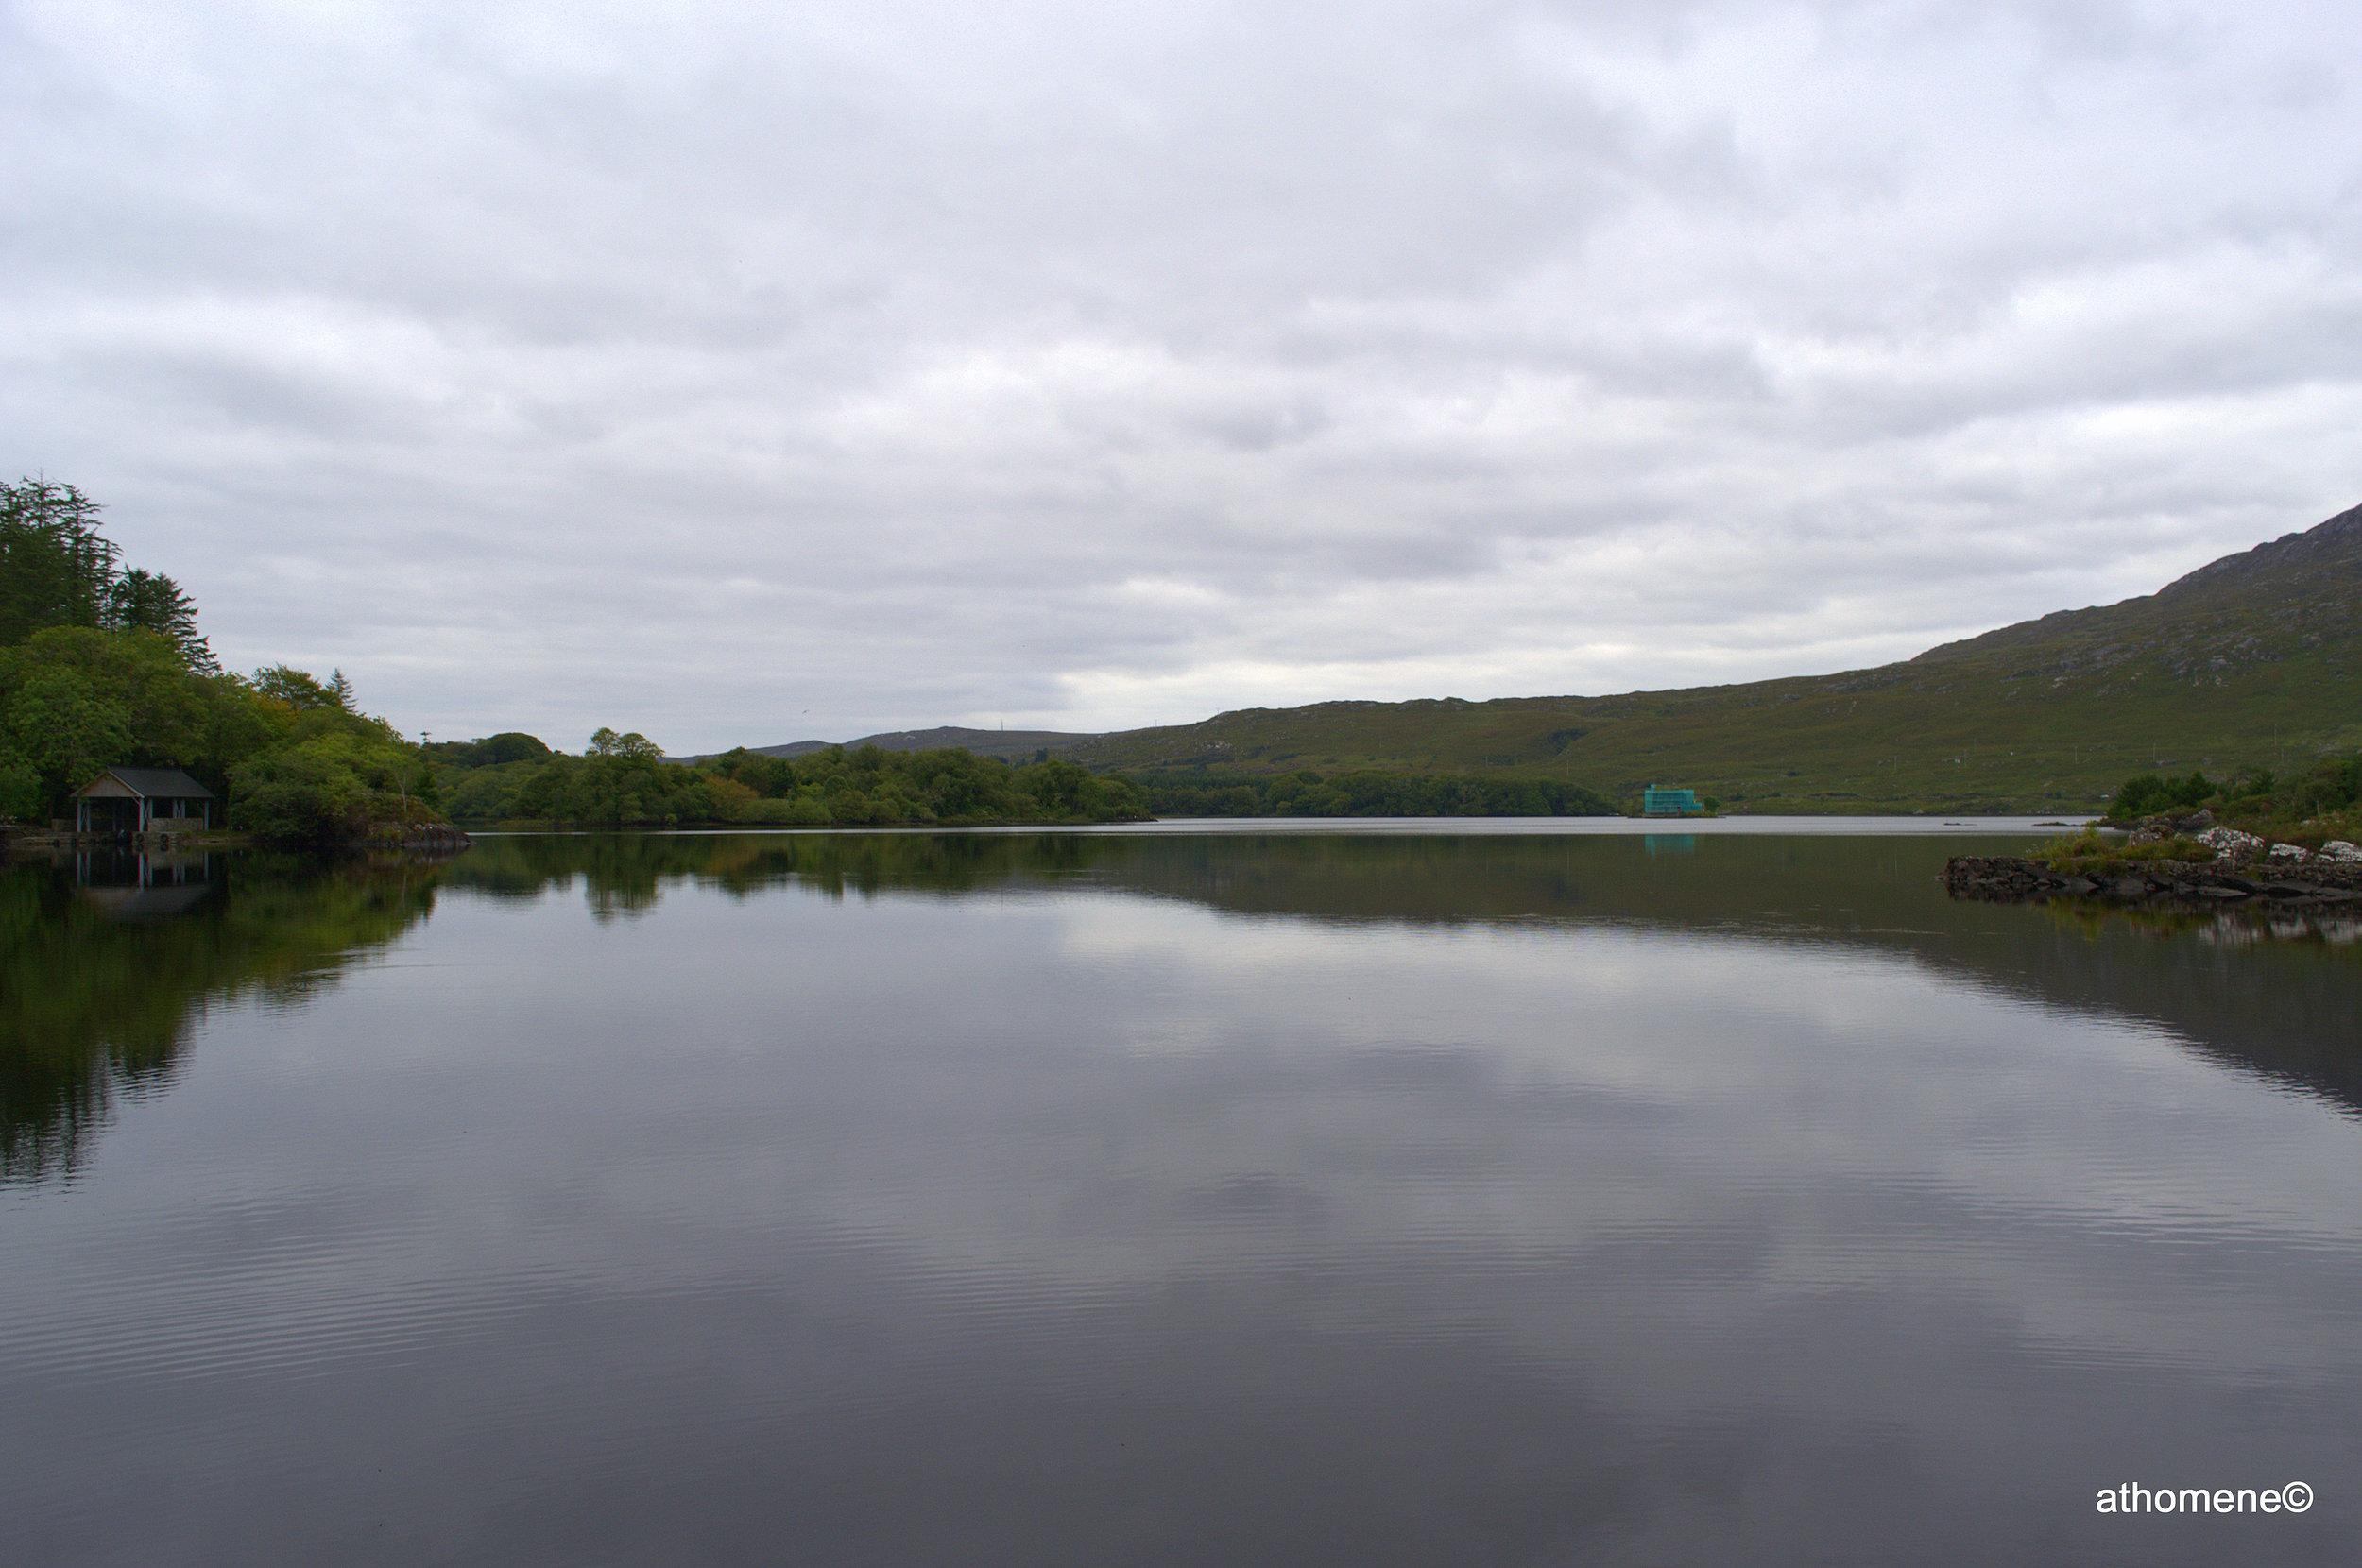 Ballyhanich Lake, Connemara, County Galway, Ireland